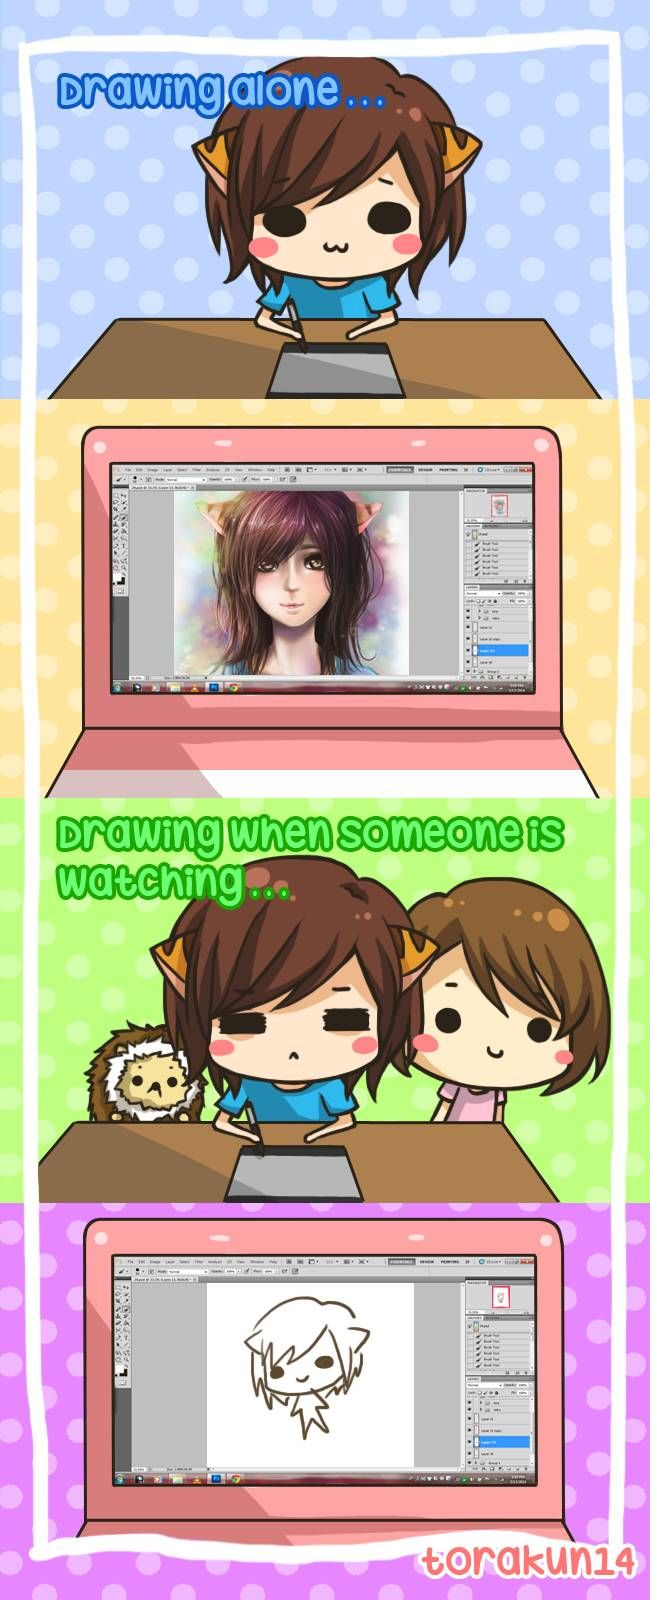 Torakun Comics :: Drawing when someone is watching   Tapastic Comics - image 1